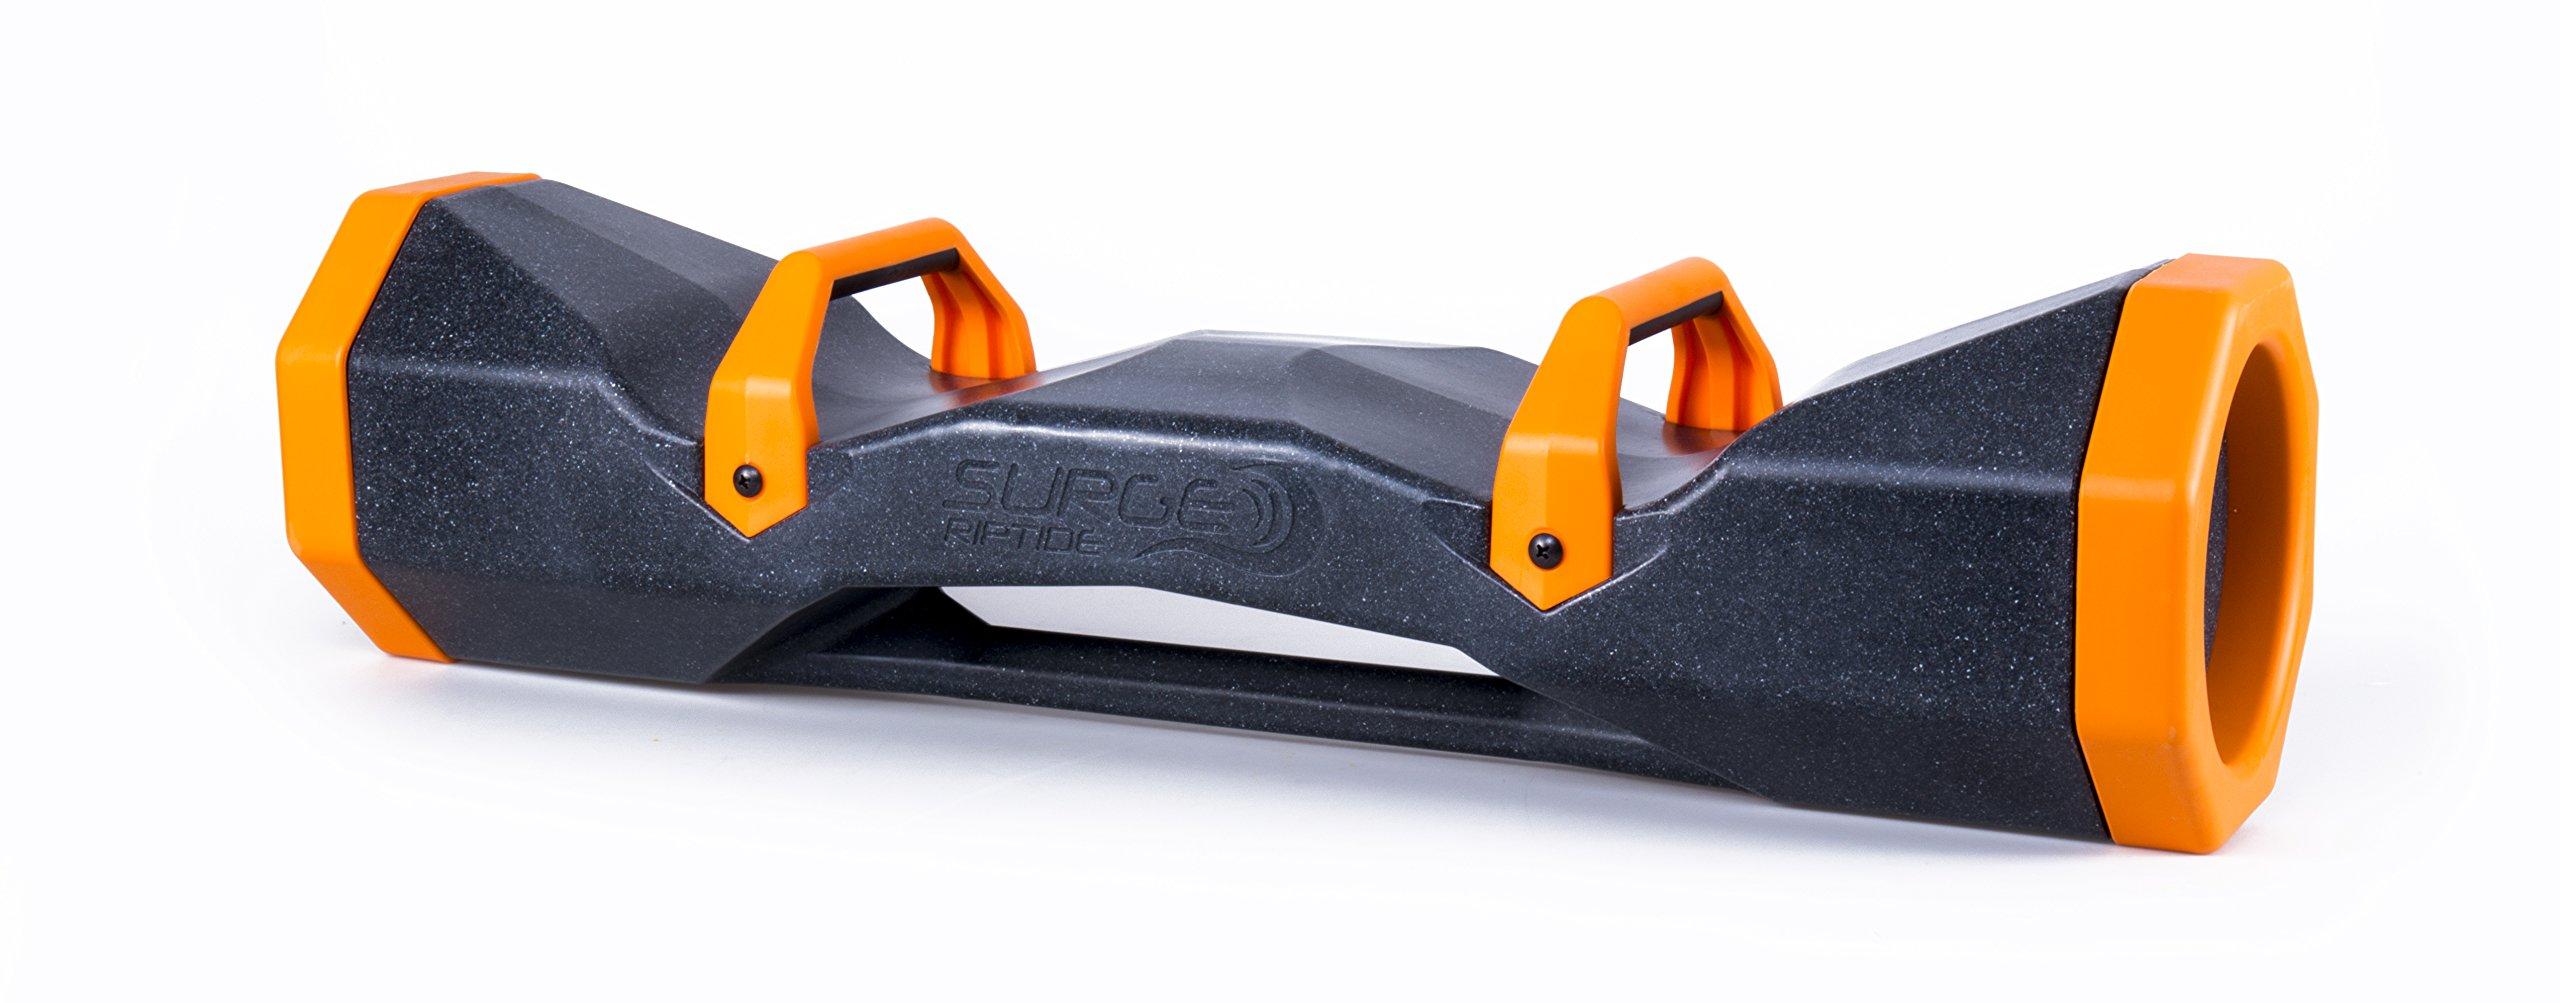 Surge Storm 40 Water Filled Adjustable Weight Tube, Home Gym Equipment, 34'' - Black/Orange